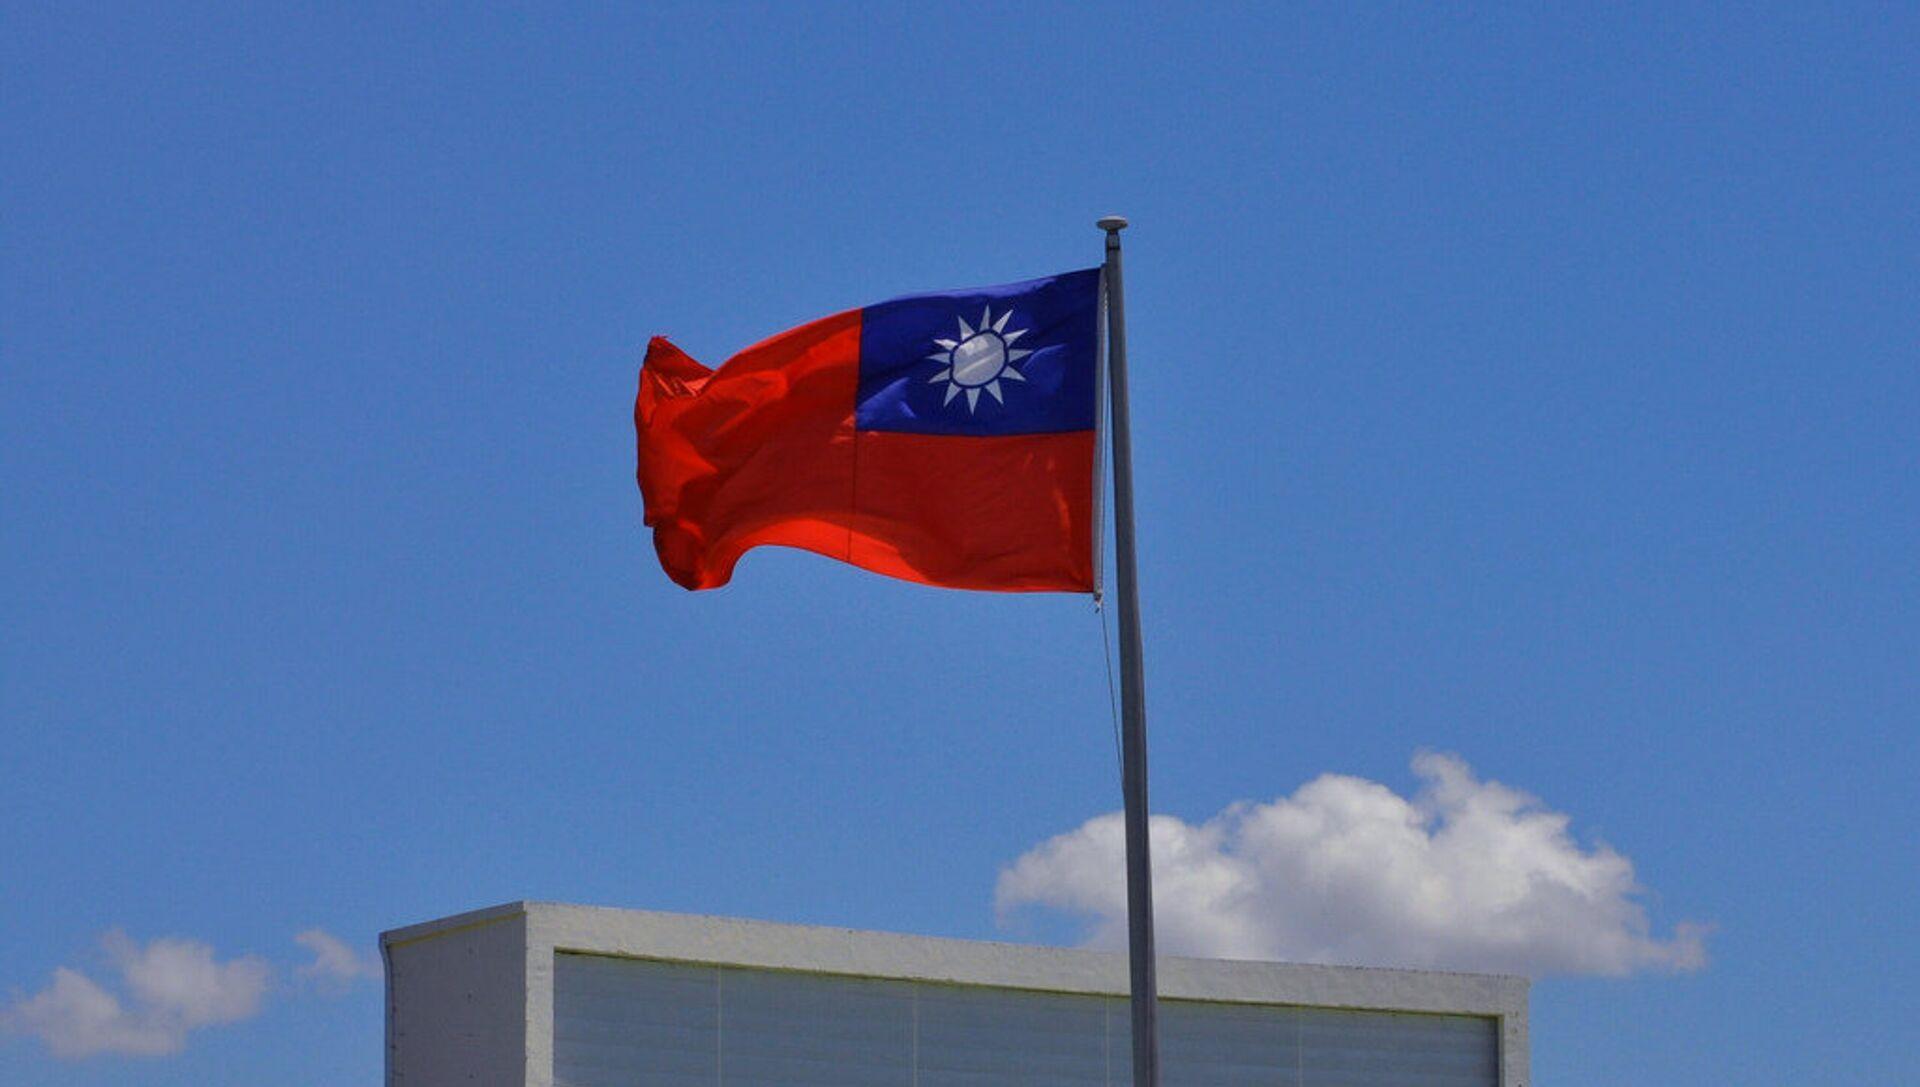 台湾の国旗 - Sputnik 日本, 1920, 22.09.2021